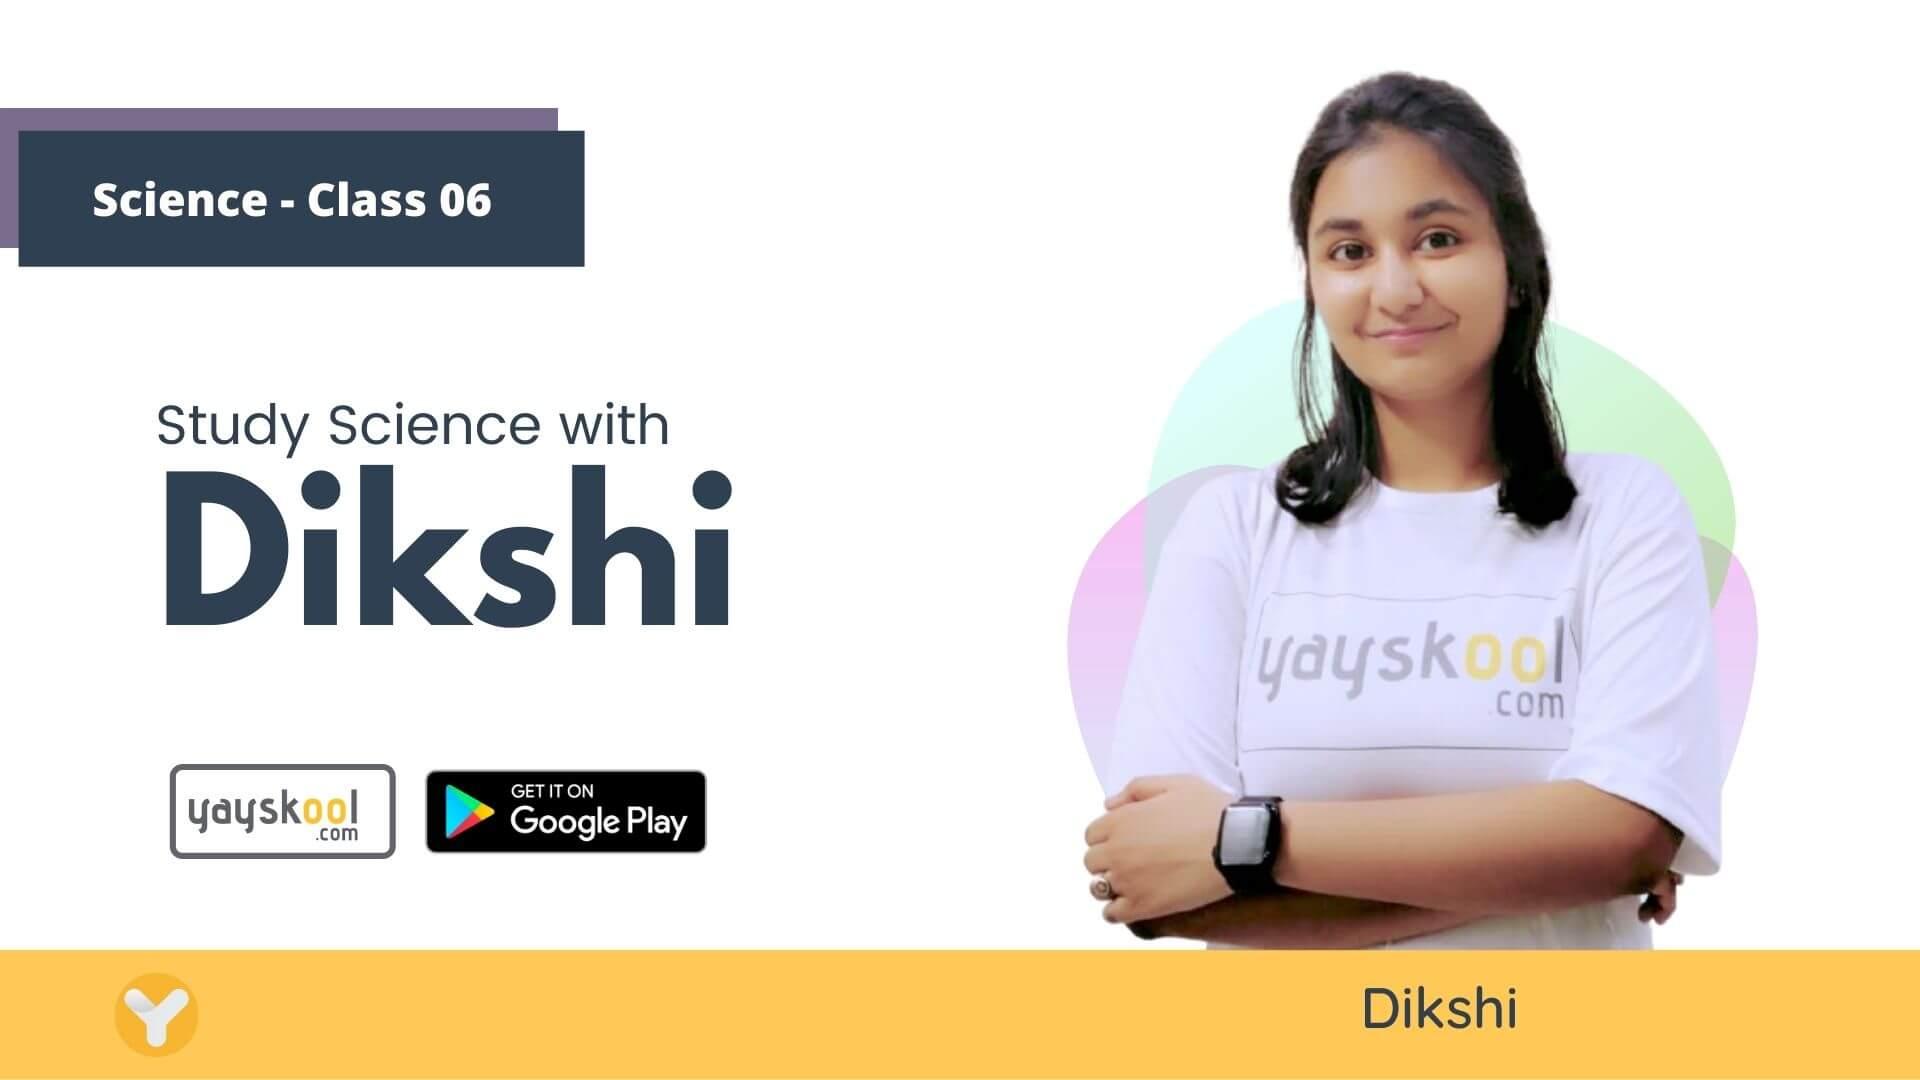 science-course-class06-dikshi